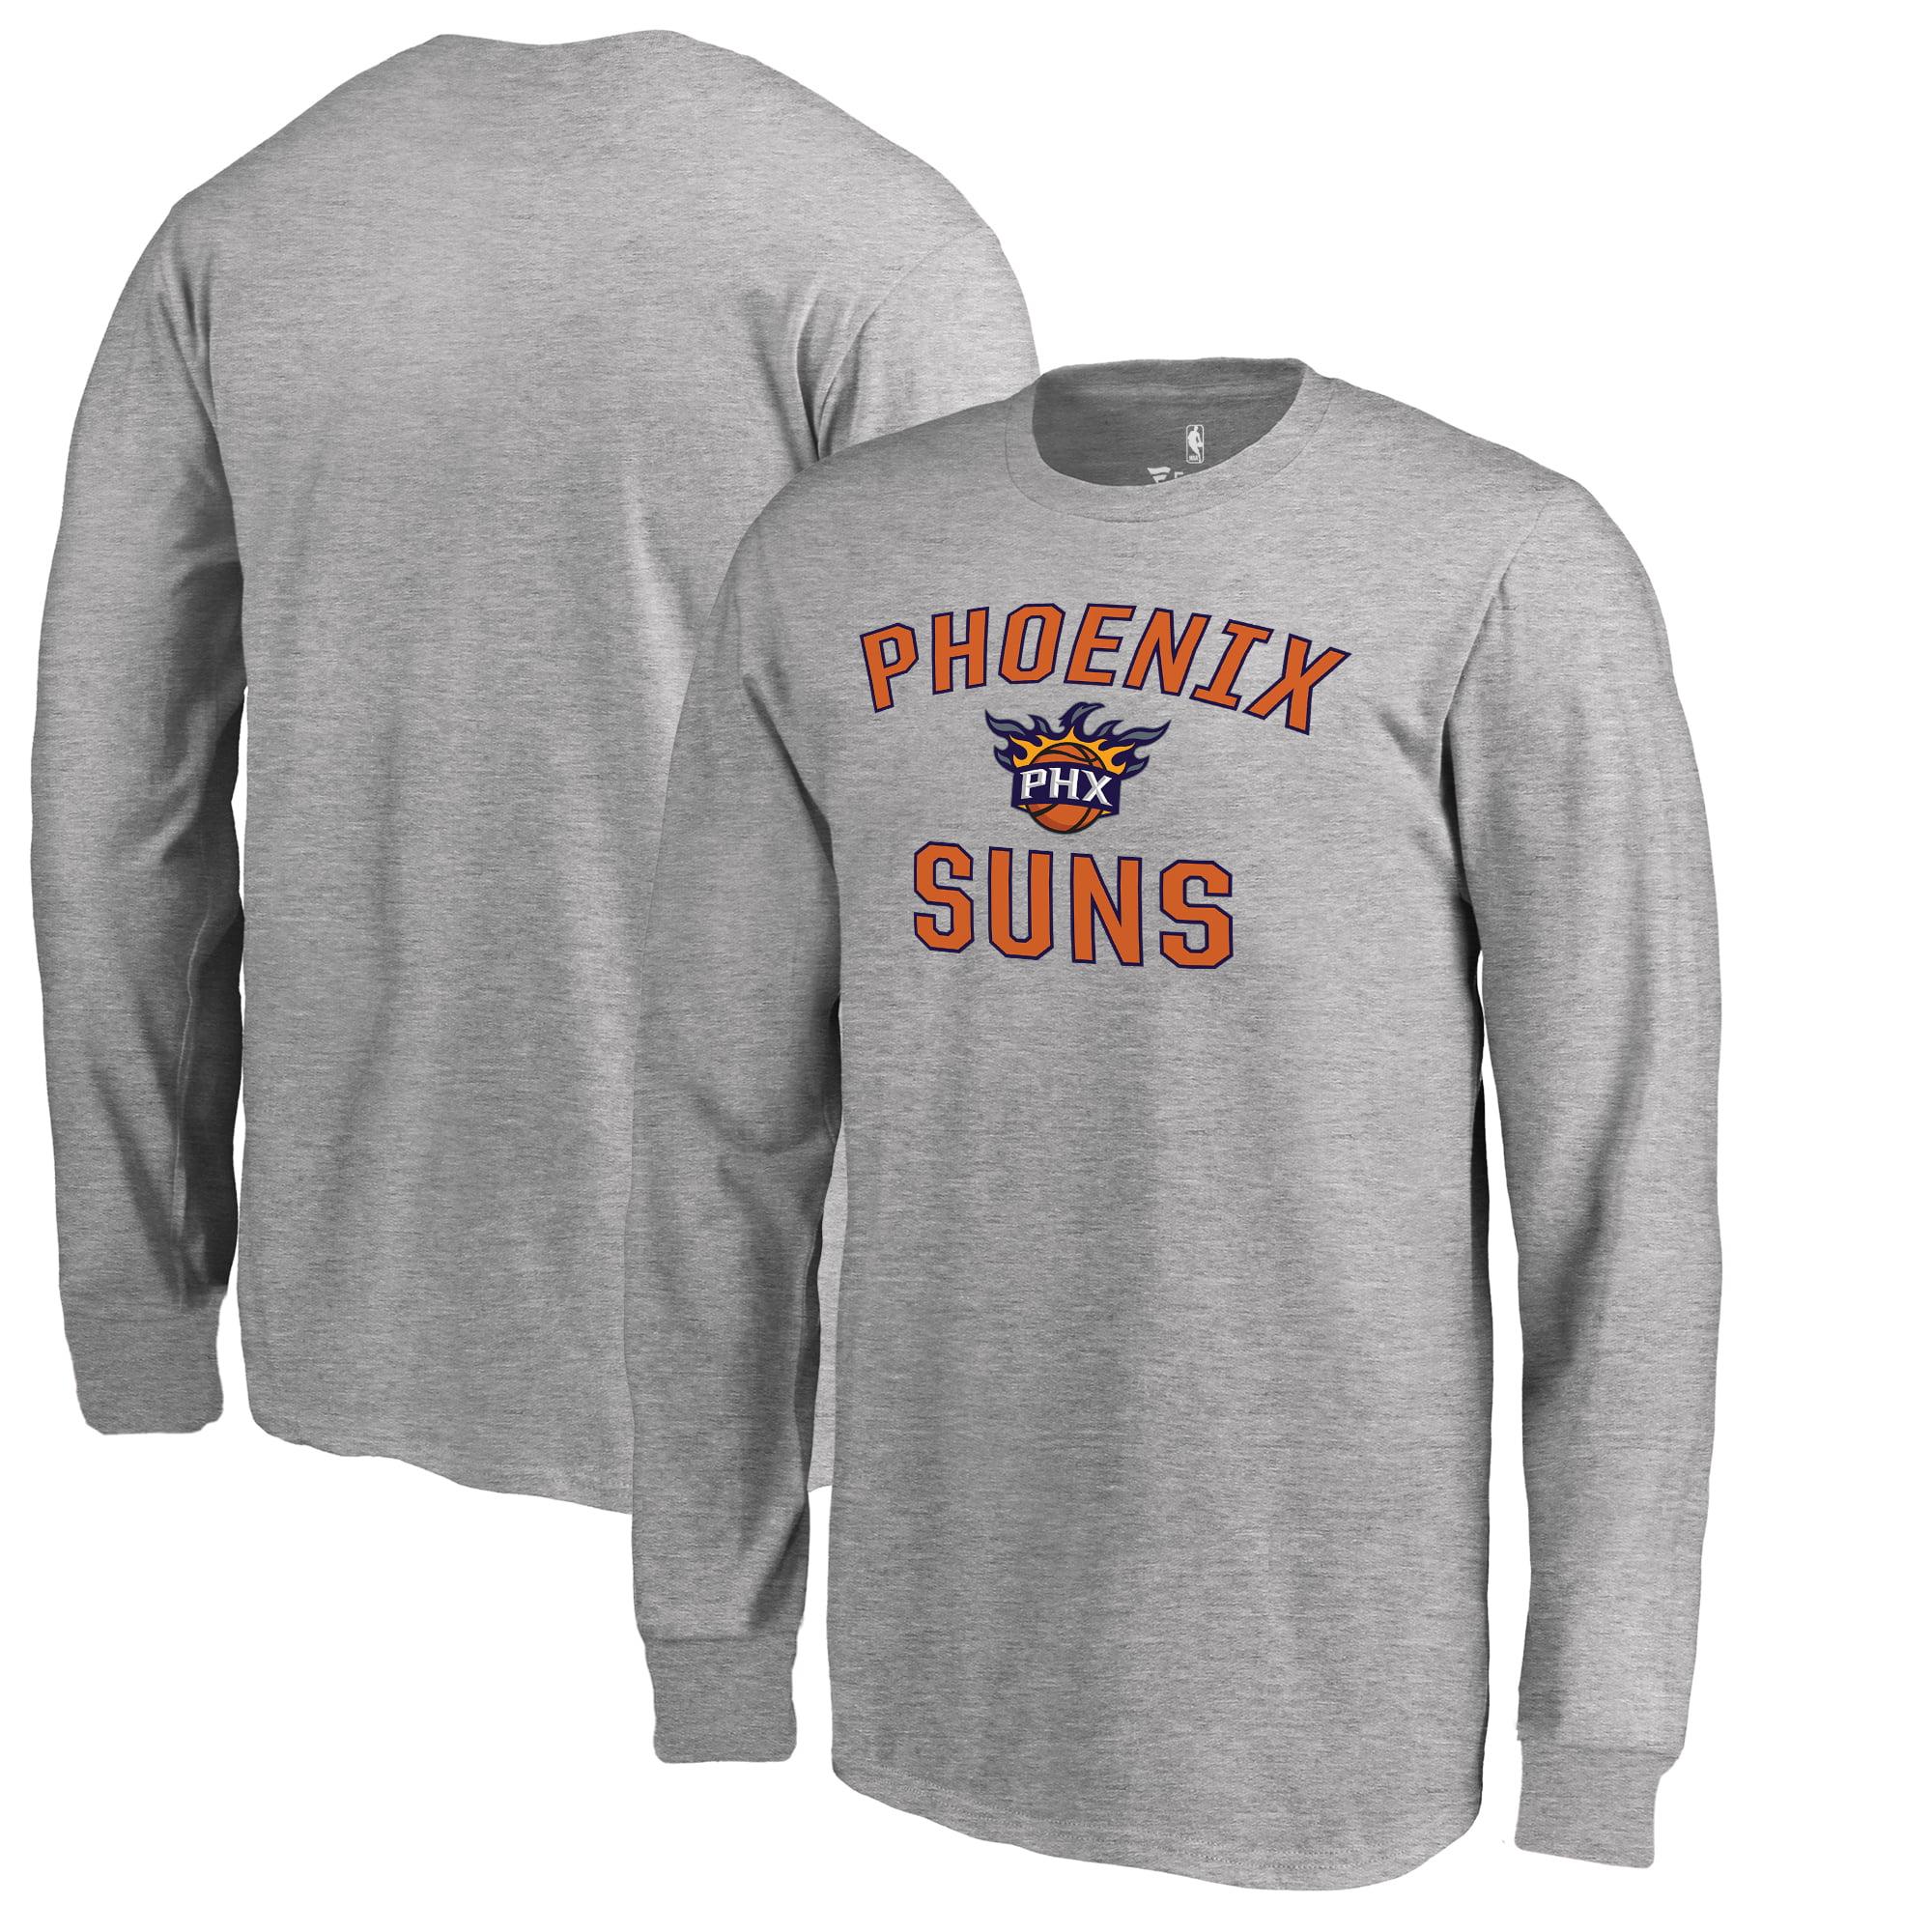 Phoenix Suns Fanatics Branded Youth Victory Arch Long Sleeve T-Shirt - Heathered Gray